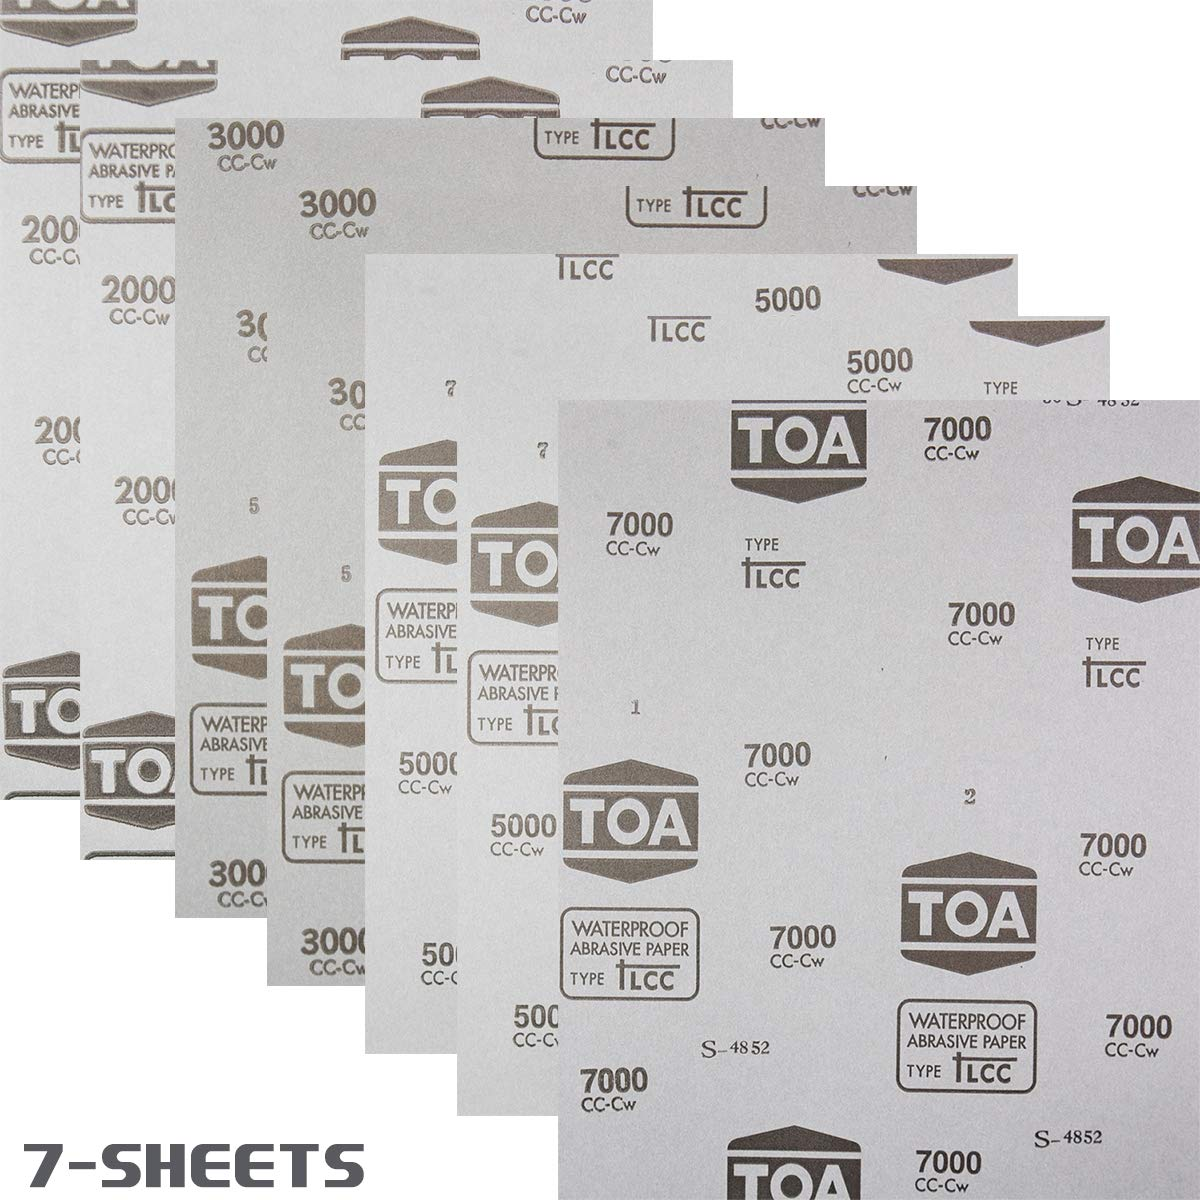 7-Sheets Premium Professional Thailand Polishing Sanding Wet//Dry Waterproof Abrasive Sandpaper Grit 2000 3000 5000 7000 Flexible Latex Model TOAPC 991A